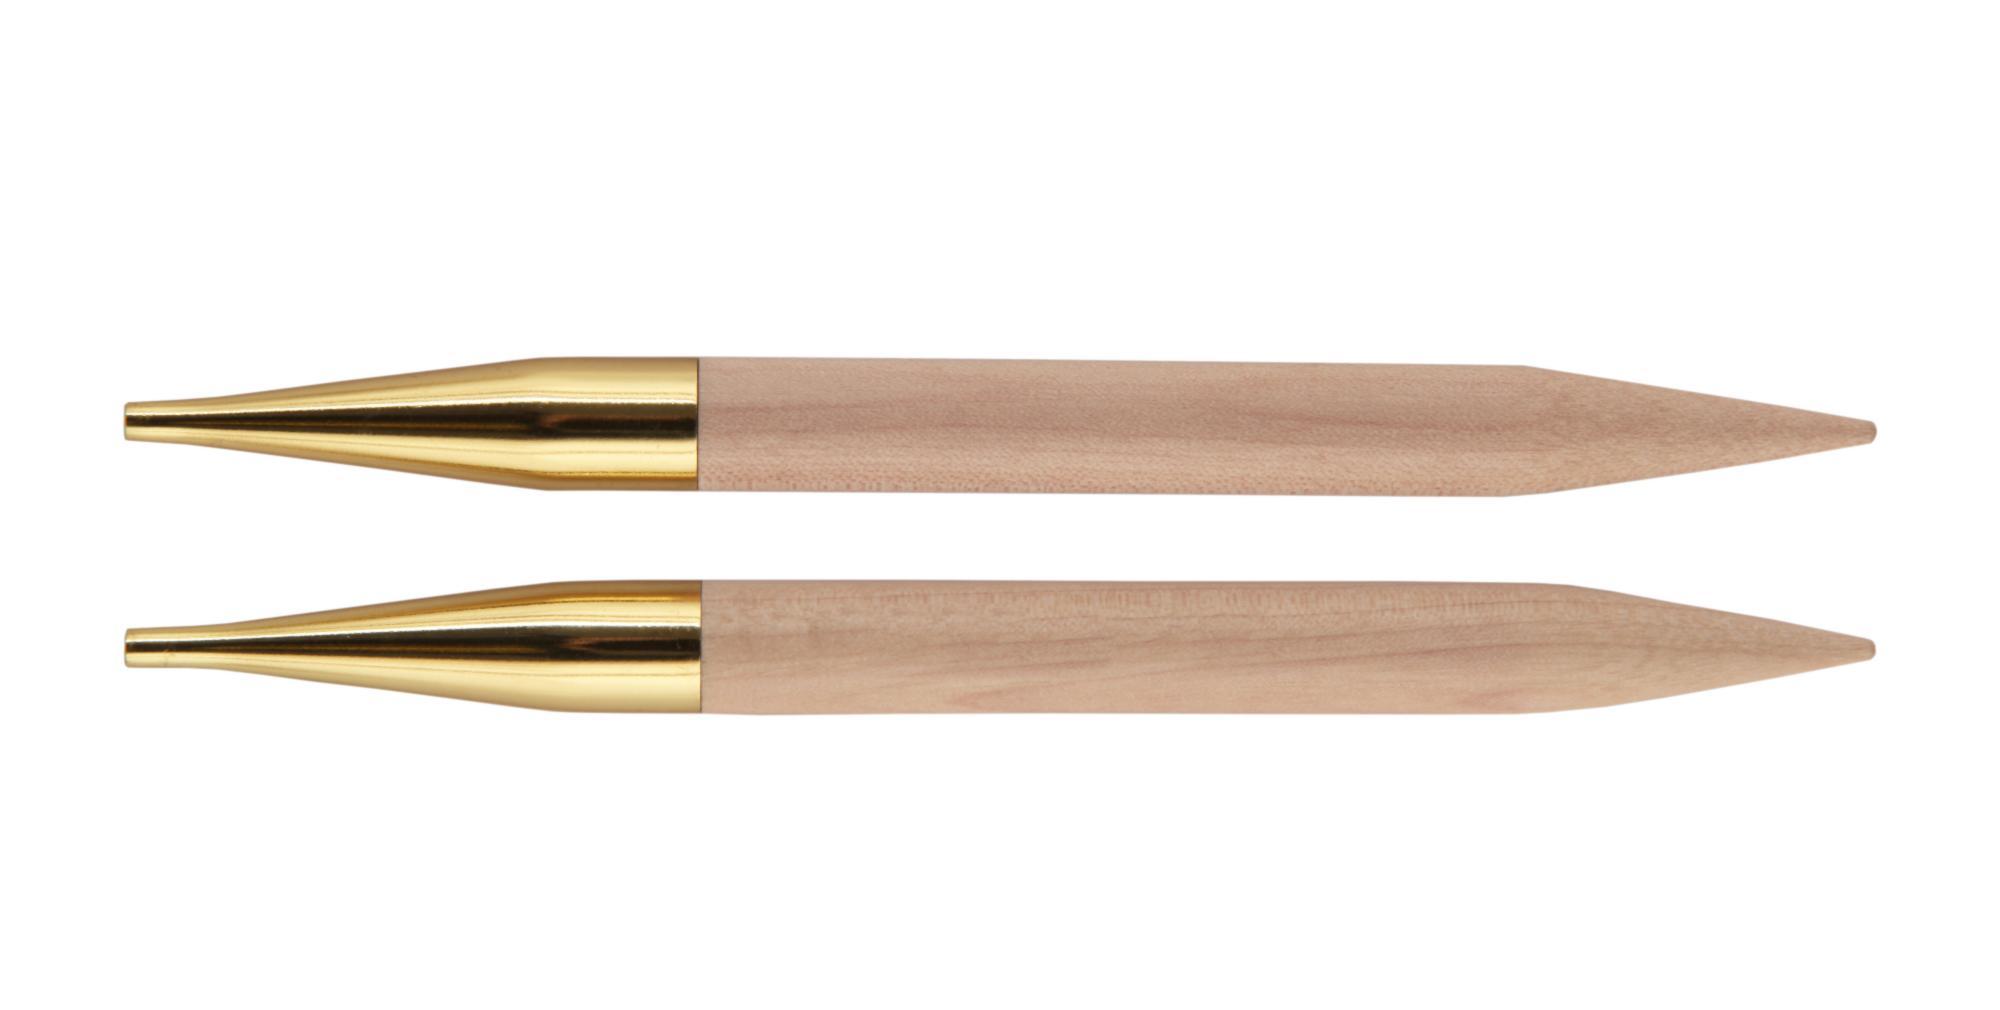 Спицы съемные Basix Birch Wood KnitPro, 35646, 15.00 мм